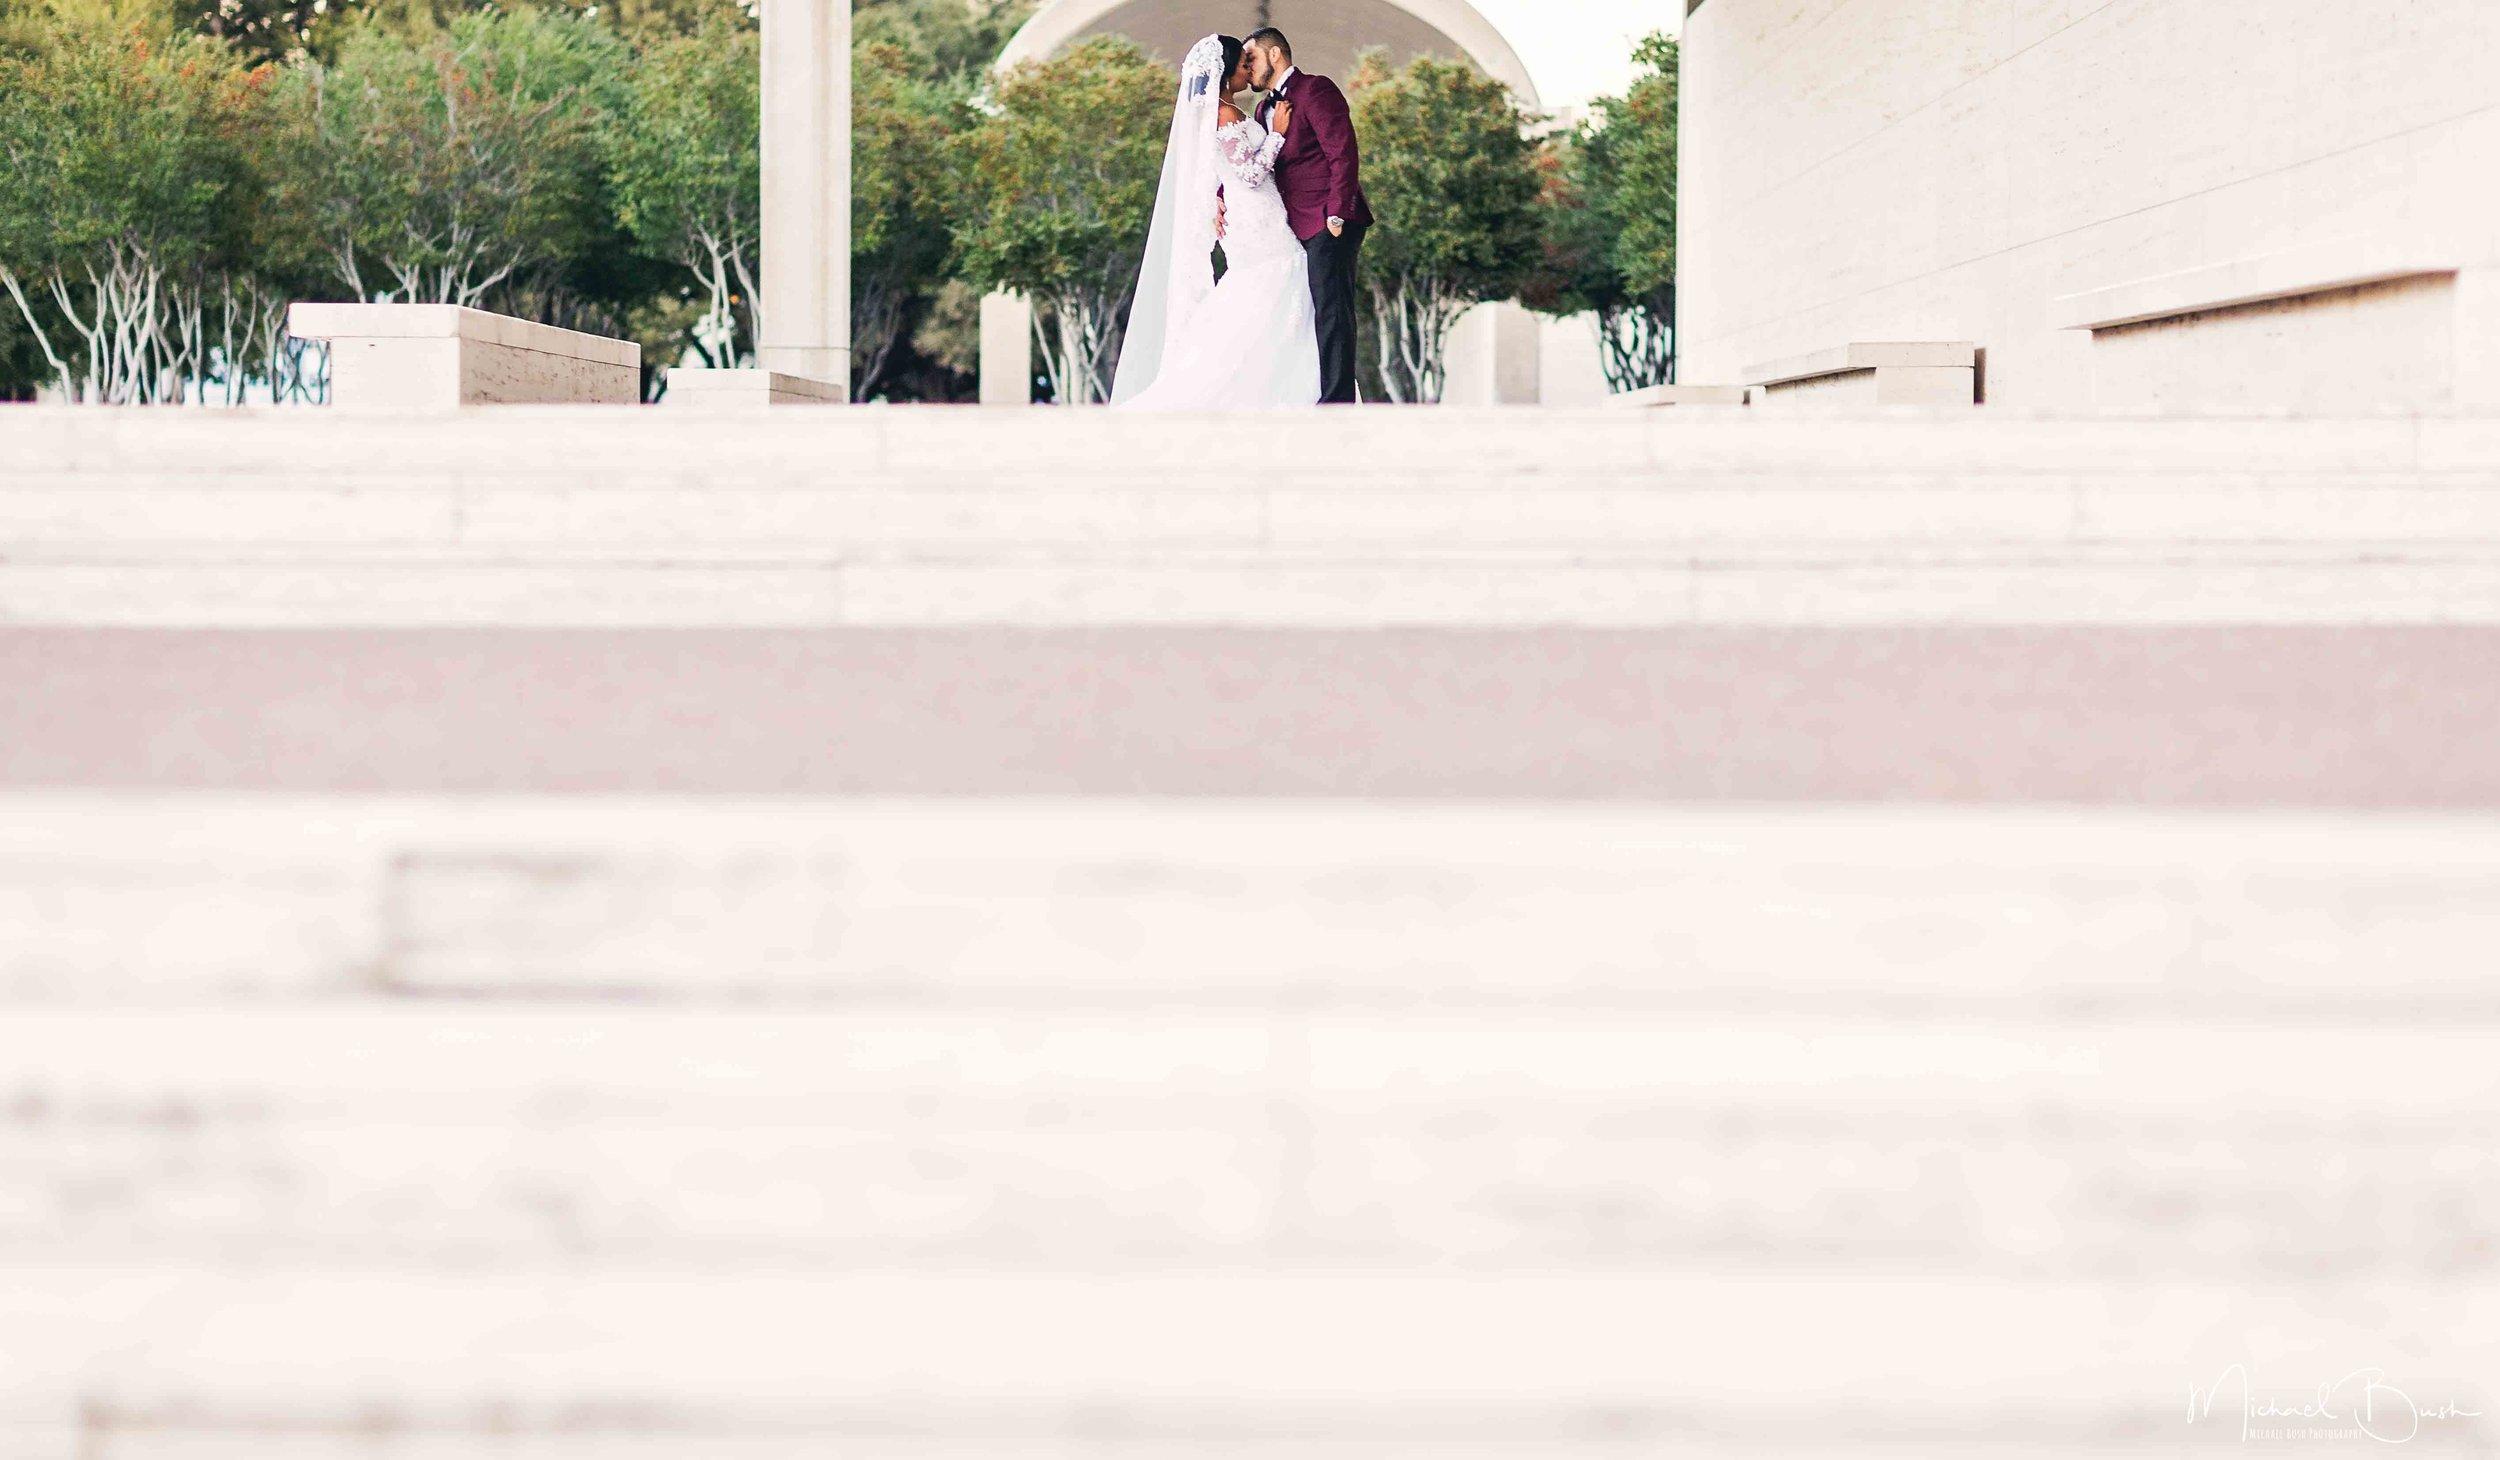 bride&groom-bride-groom-portraits-love-b&w-fort-worth-arts-musuem-kimball-art-composition.jpg